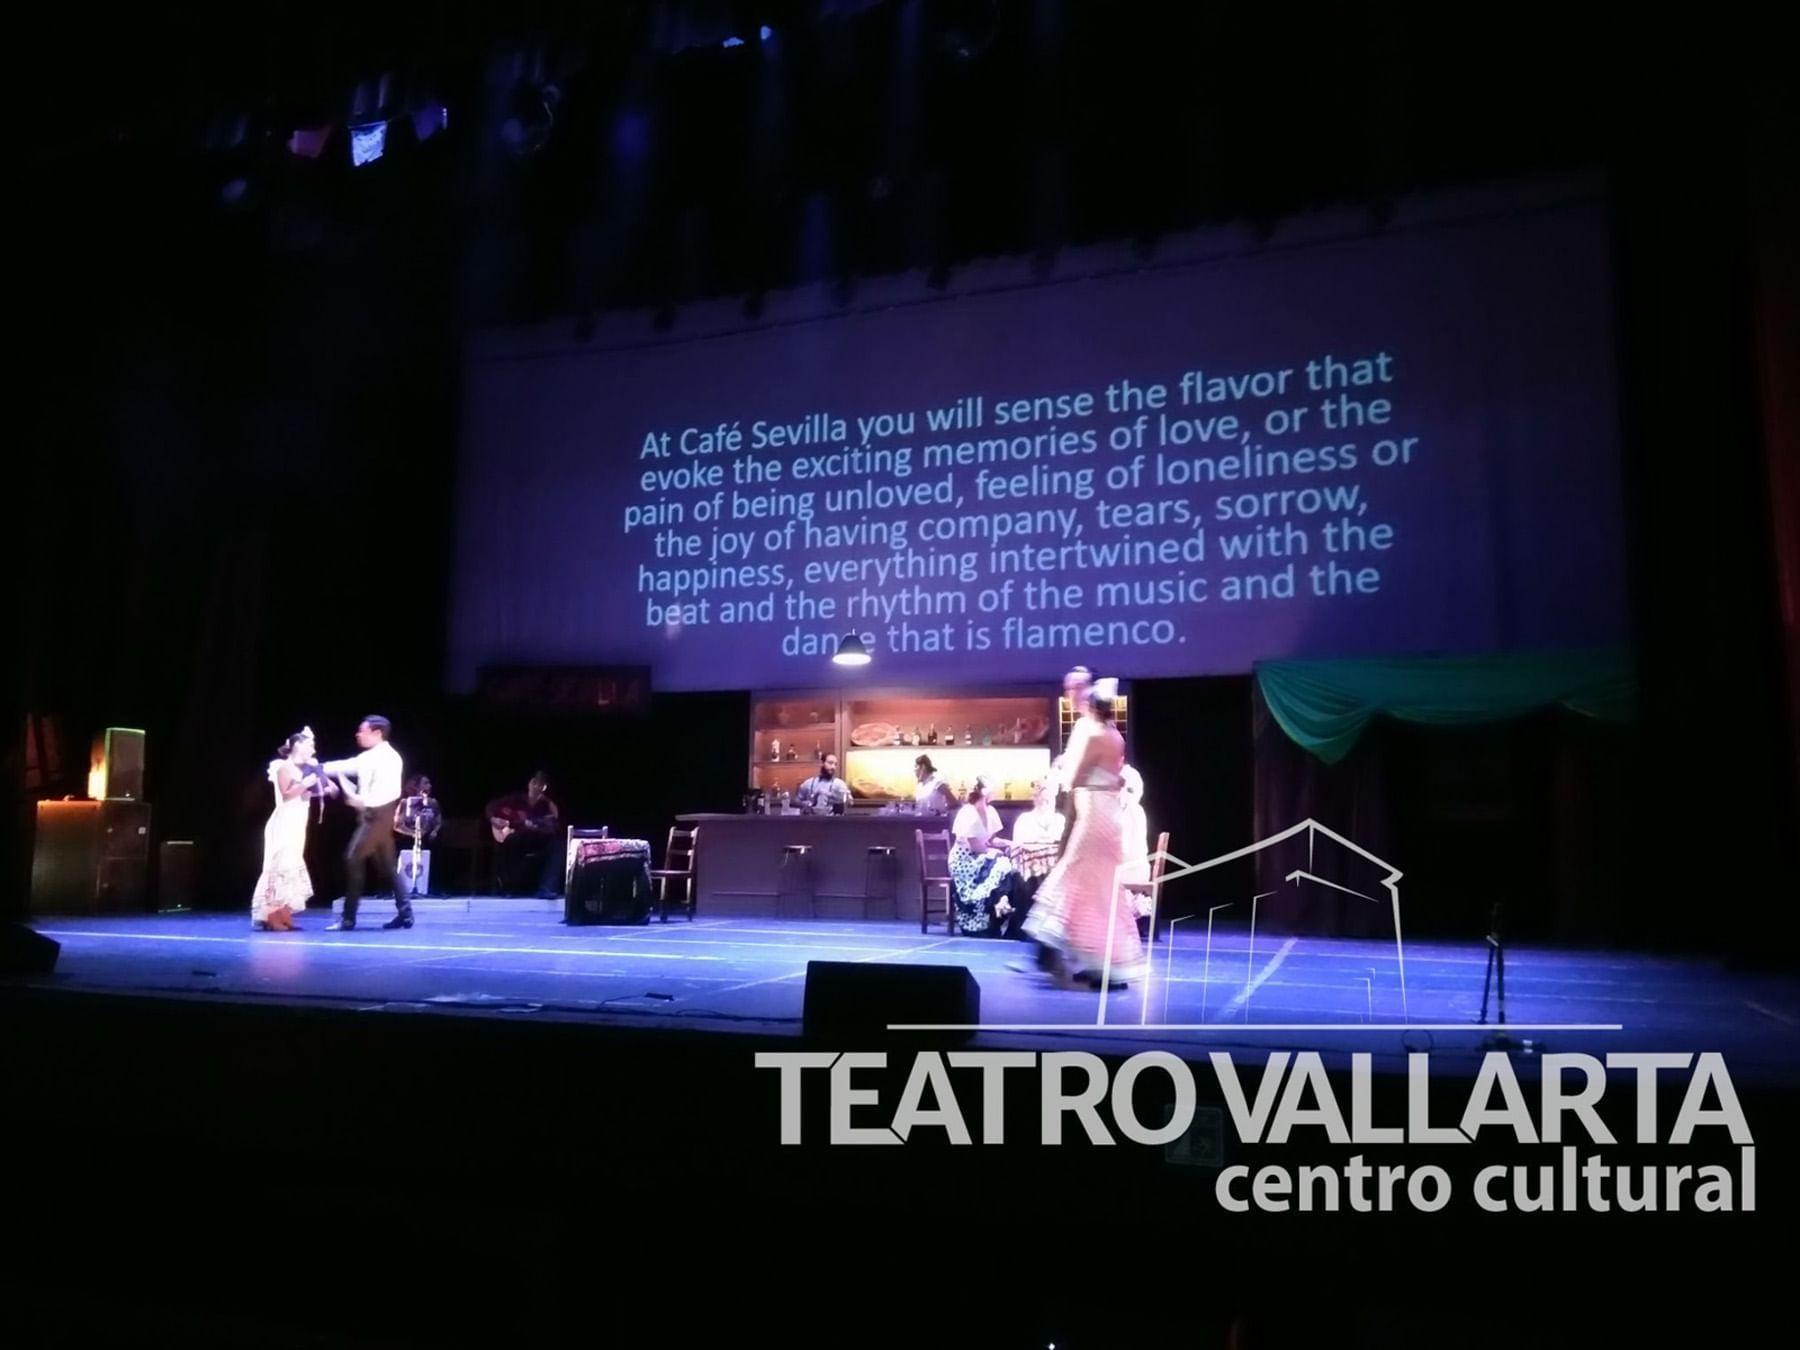 Theater Vallarta at Plaza Pelicanos Grand Beach Resort Hotel